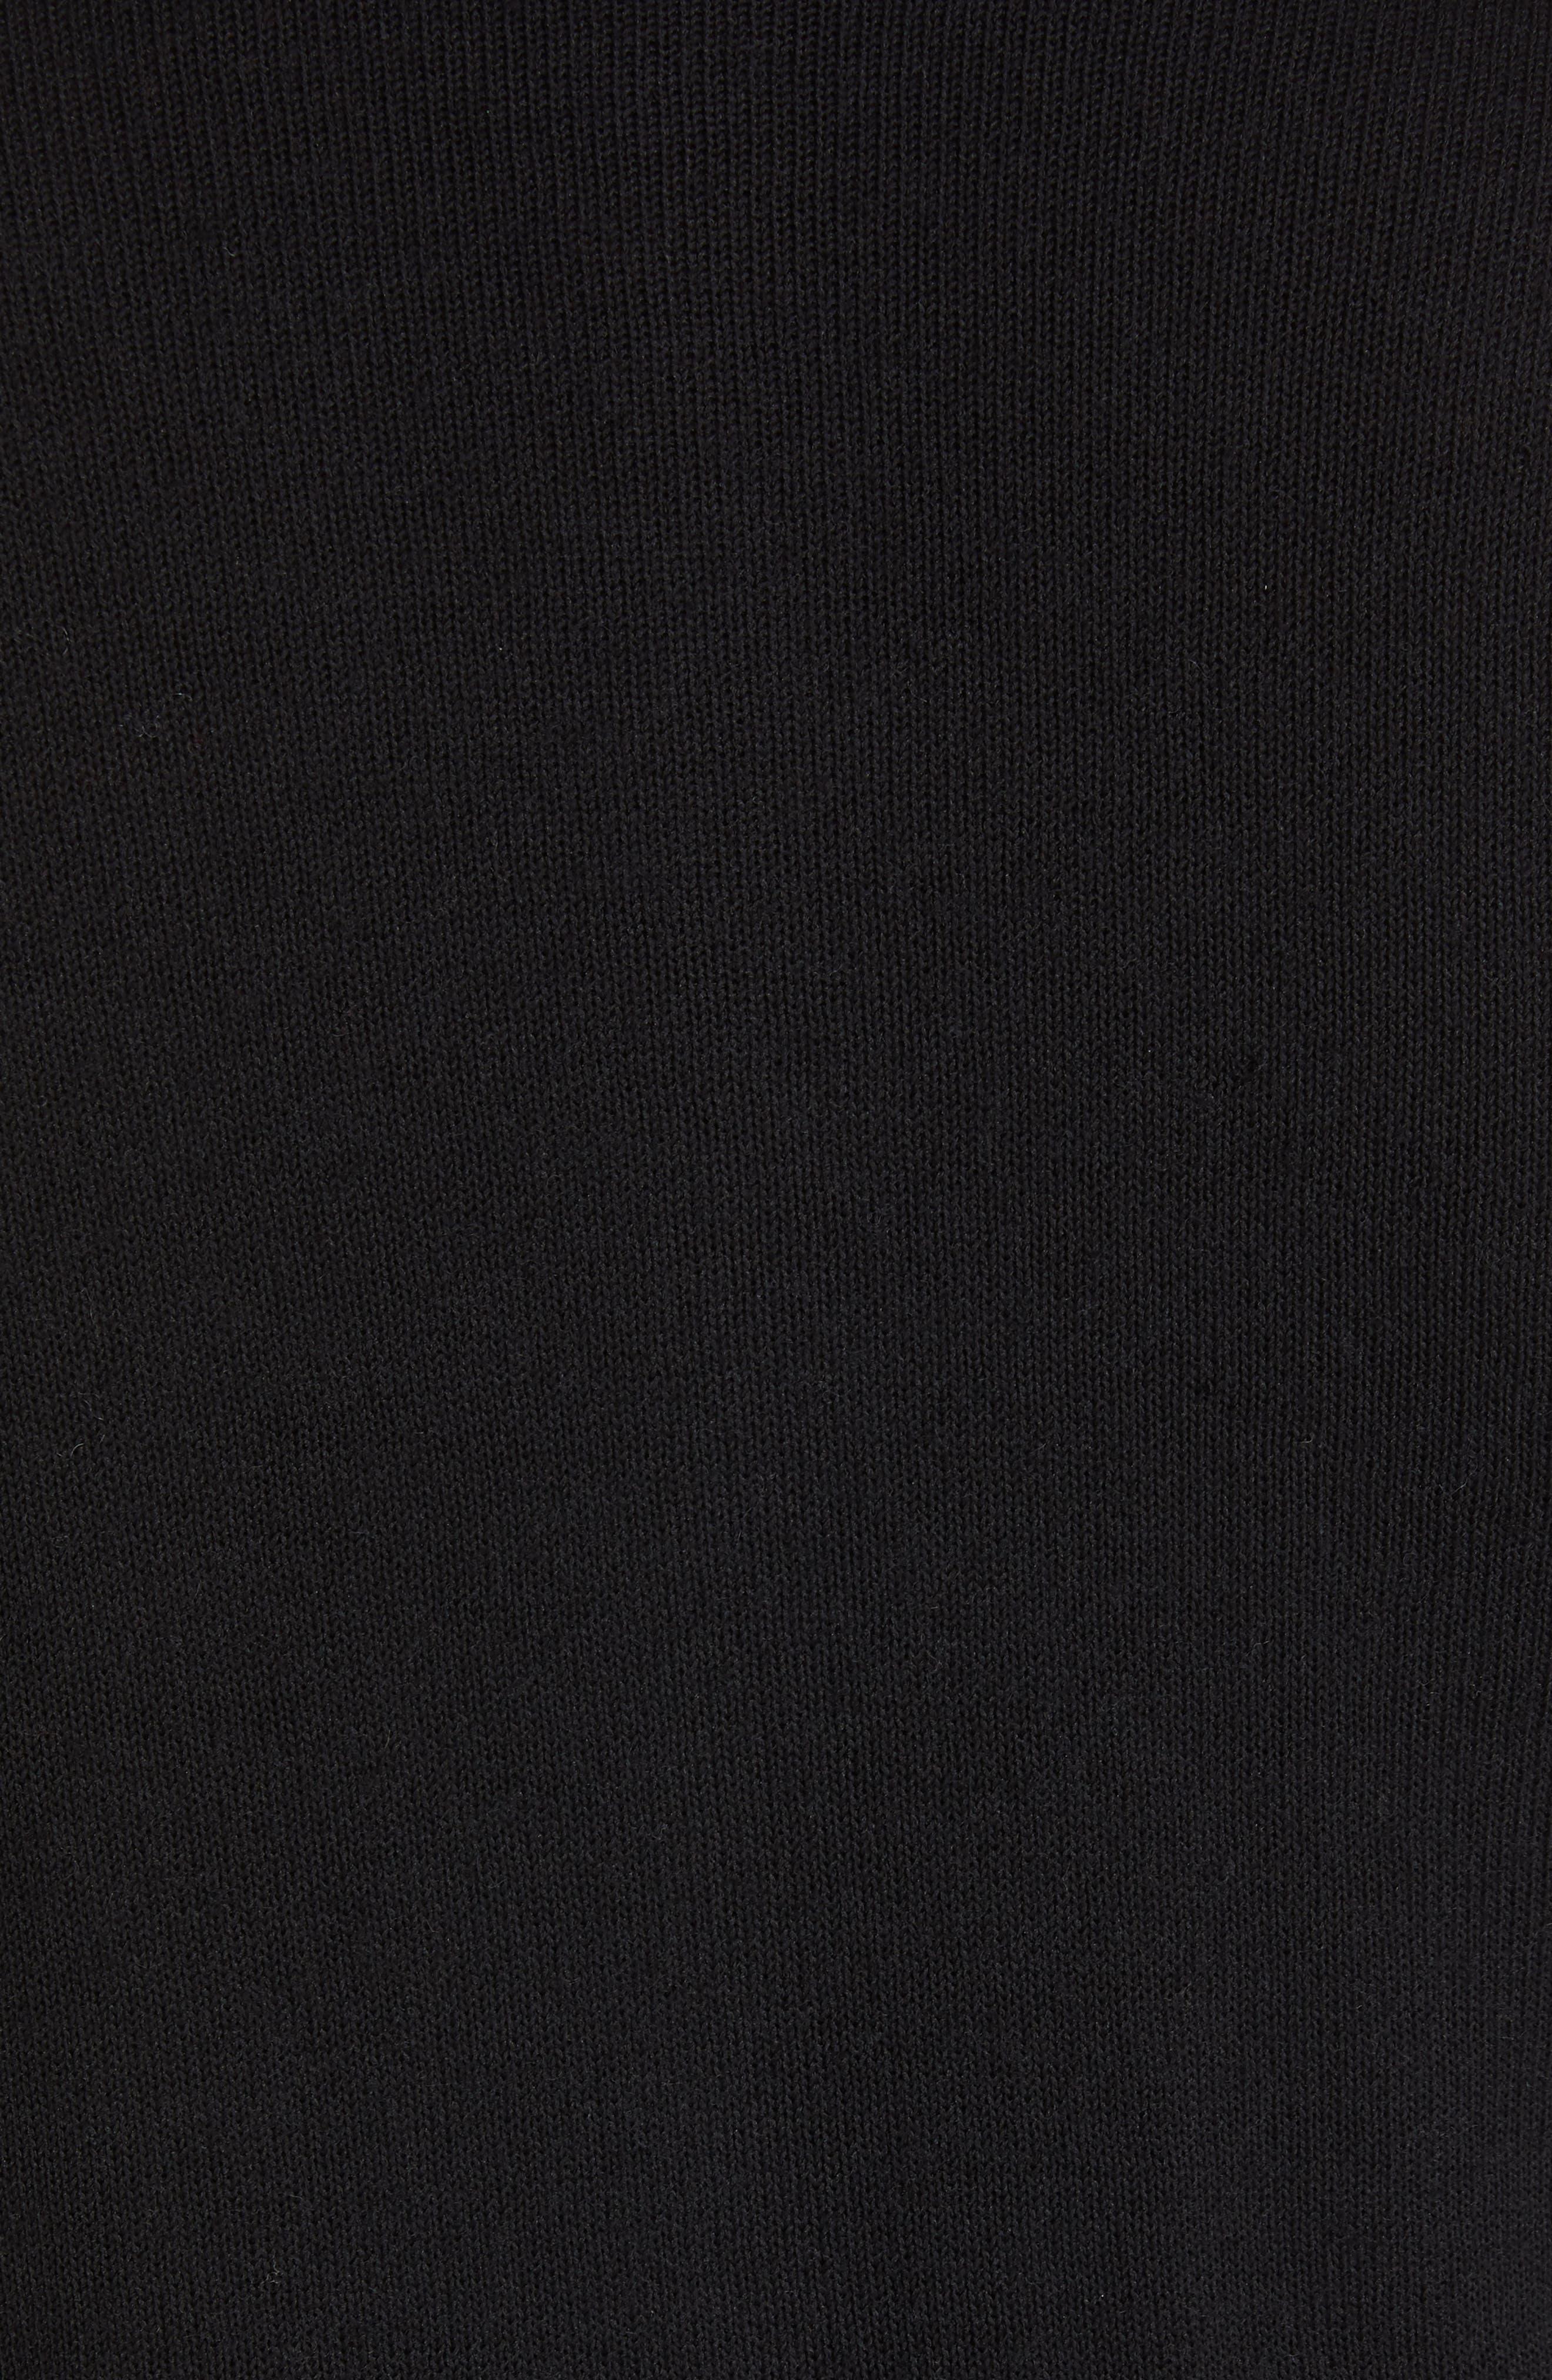 Crewneck 200 Top,                             Alternate thumbnail 6, color,                             BLACK